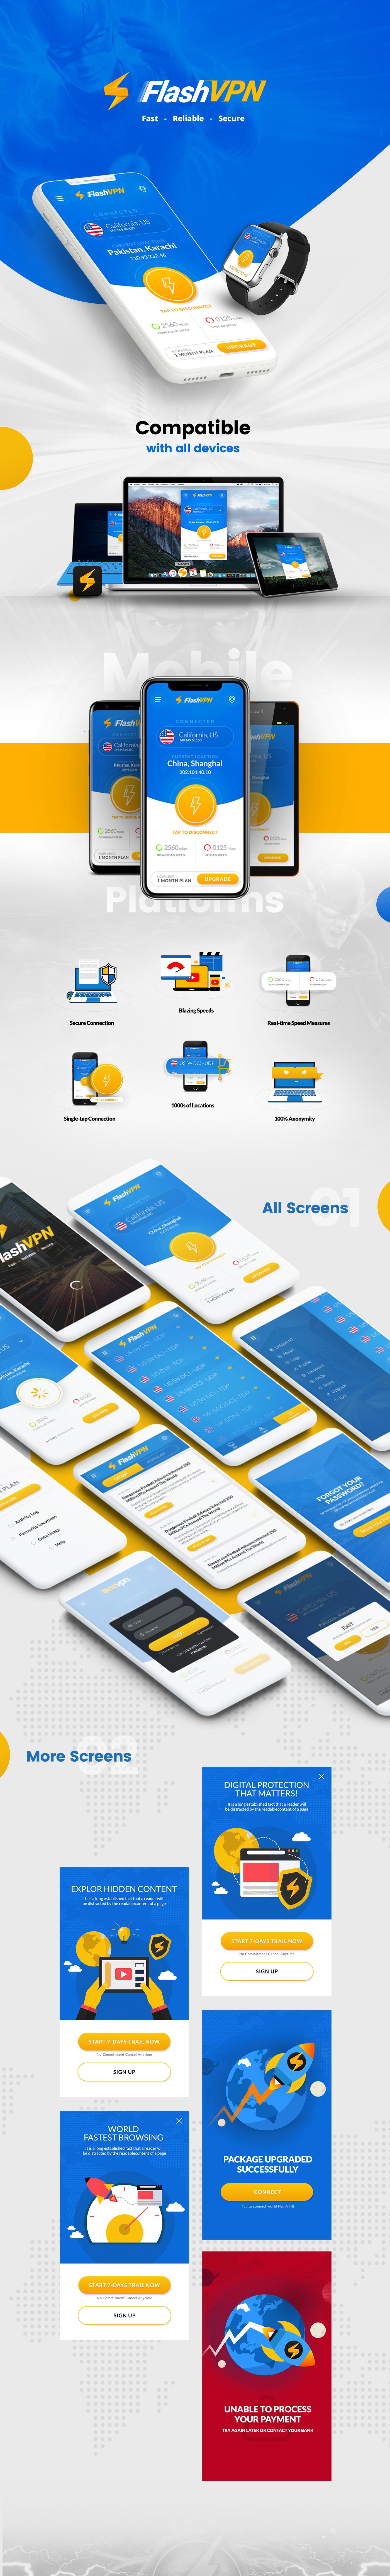 vpn proxy app android ios windows app mac app creative fastest fast